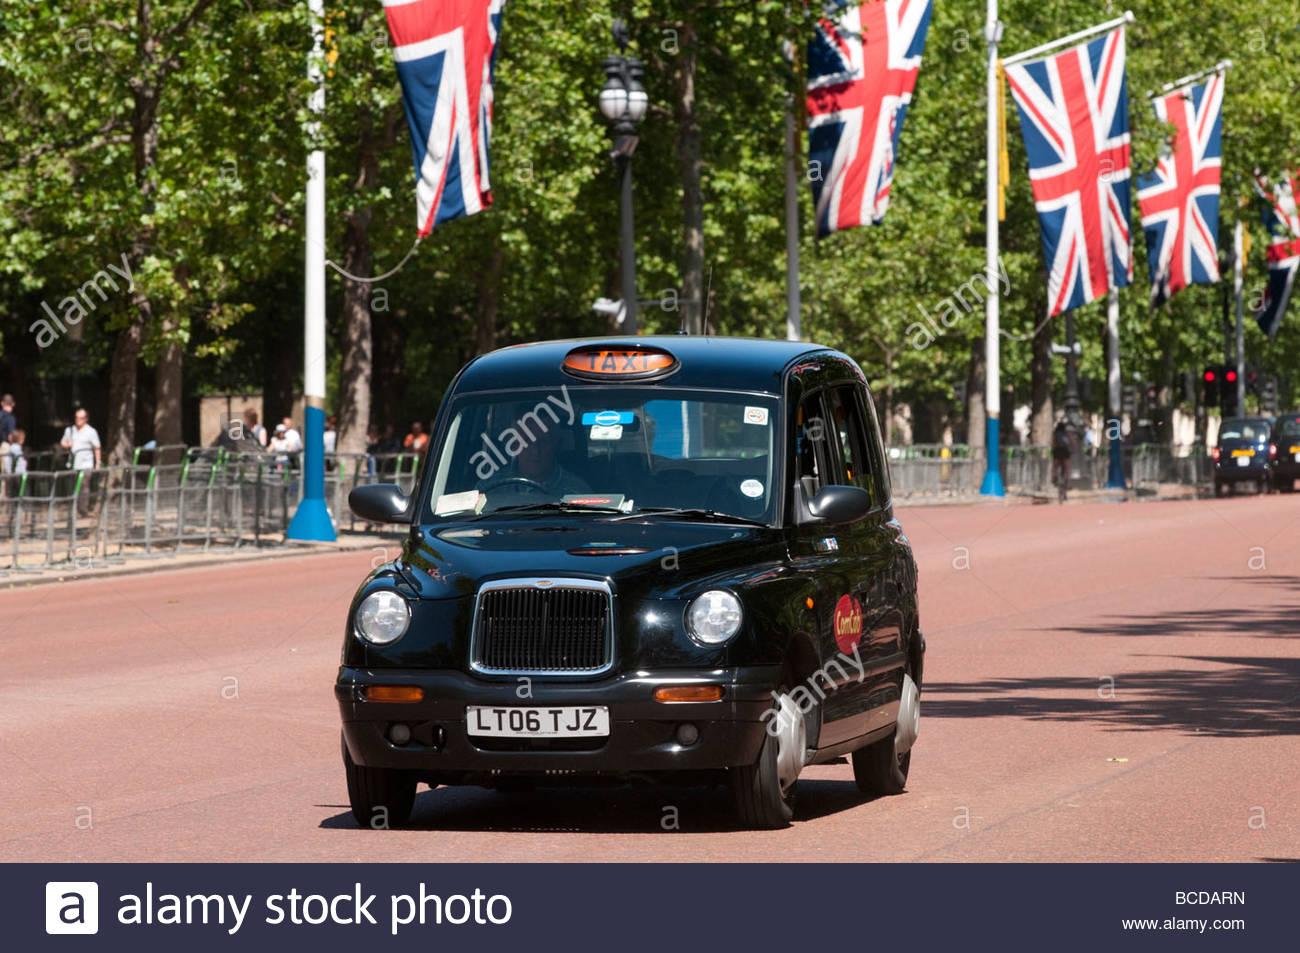 London taxi noir sur le Mall, England UK Photo Stock